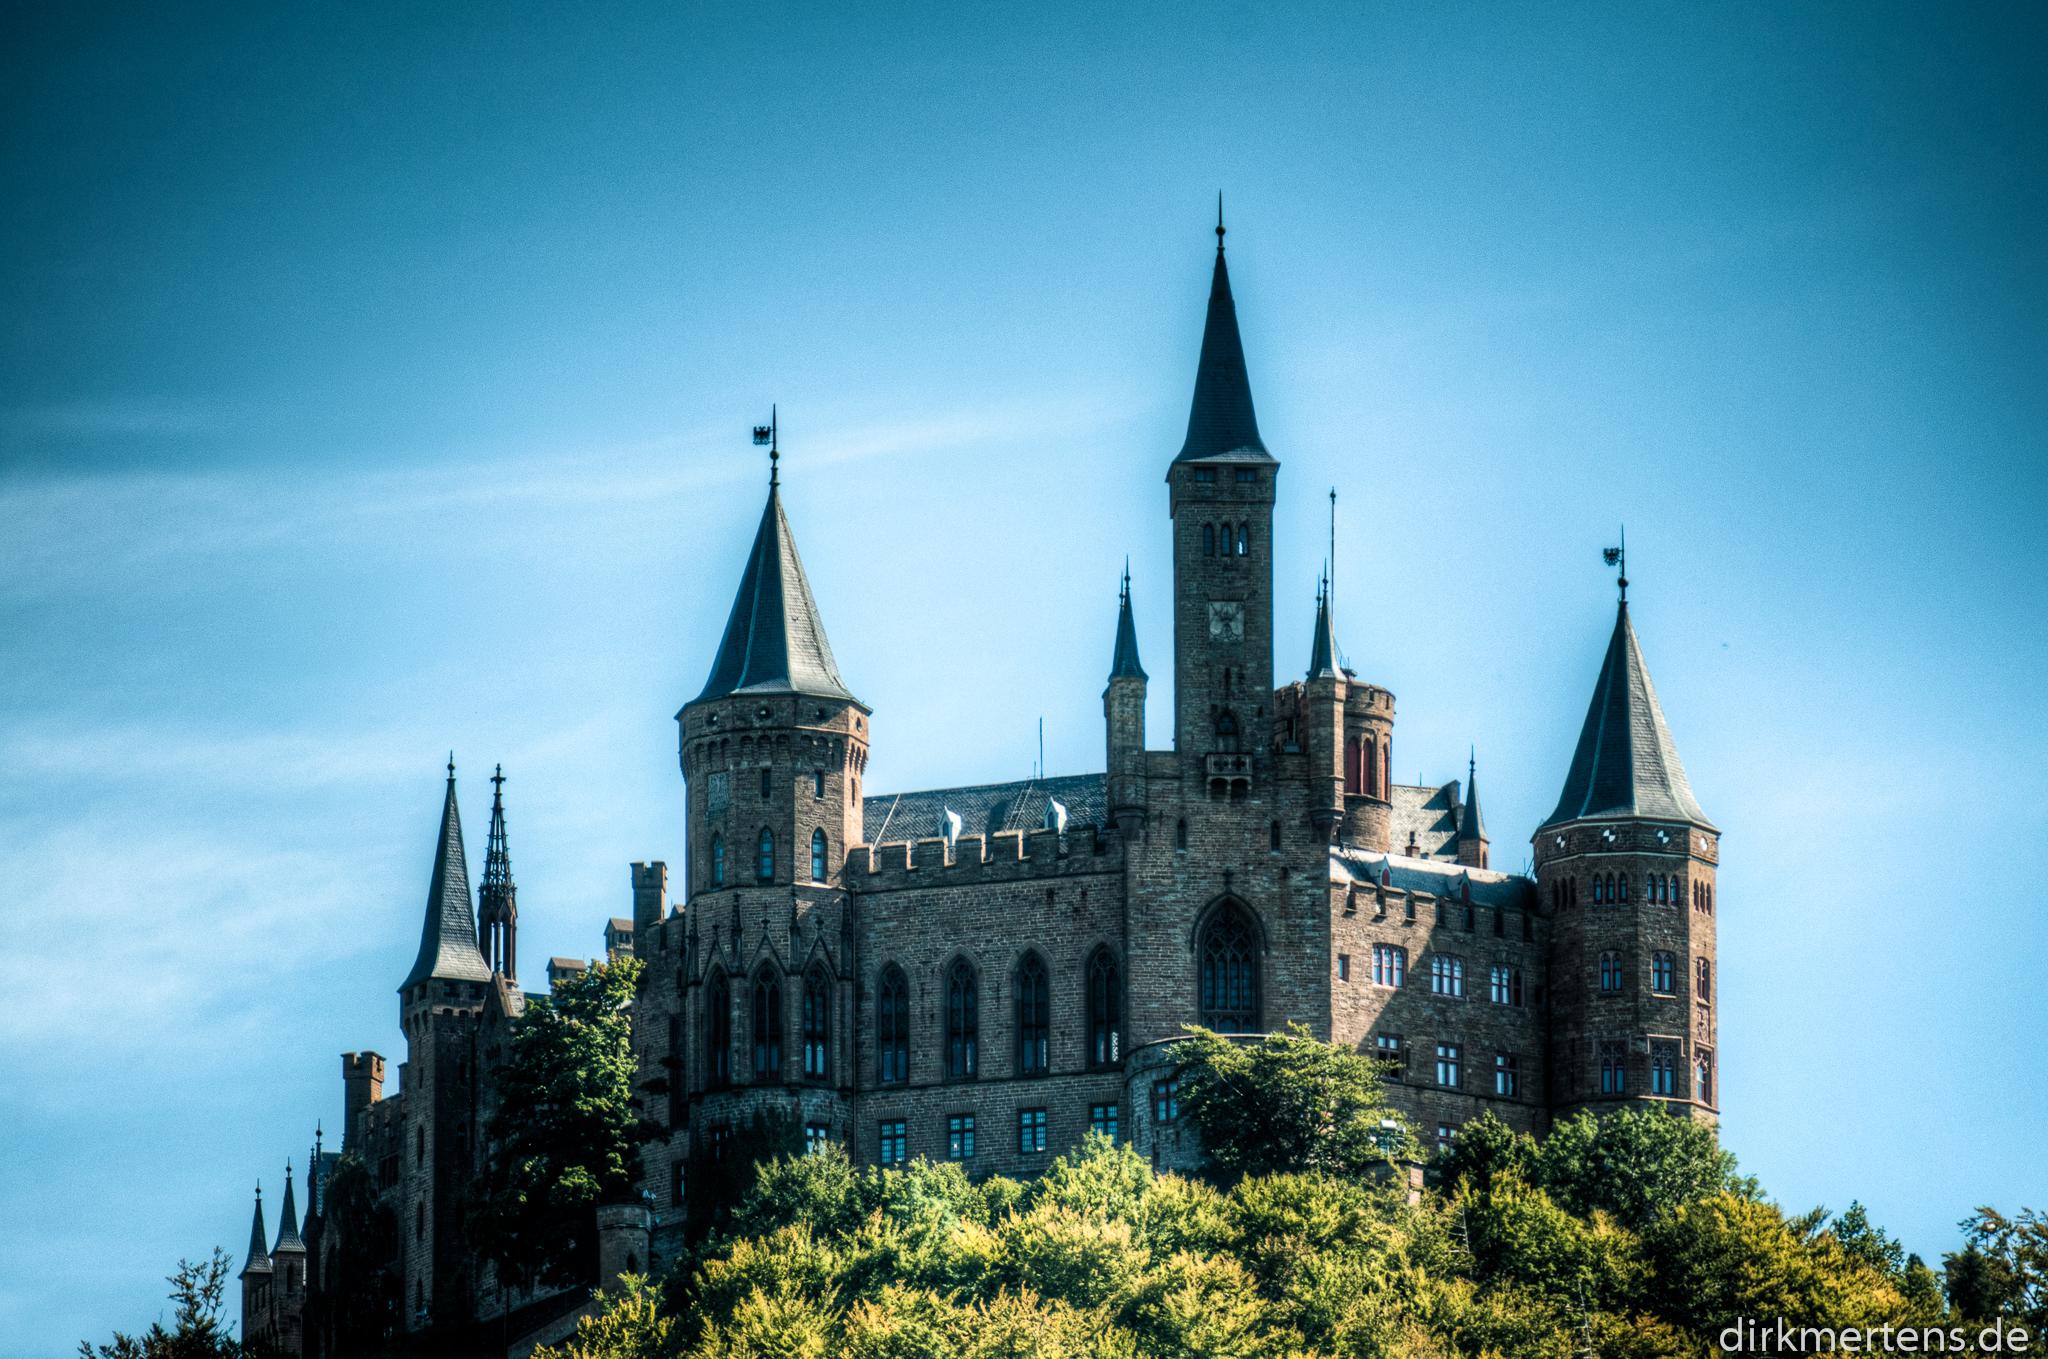 Burg Hogenzollern